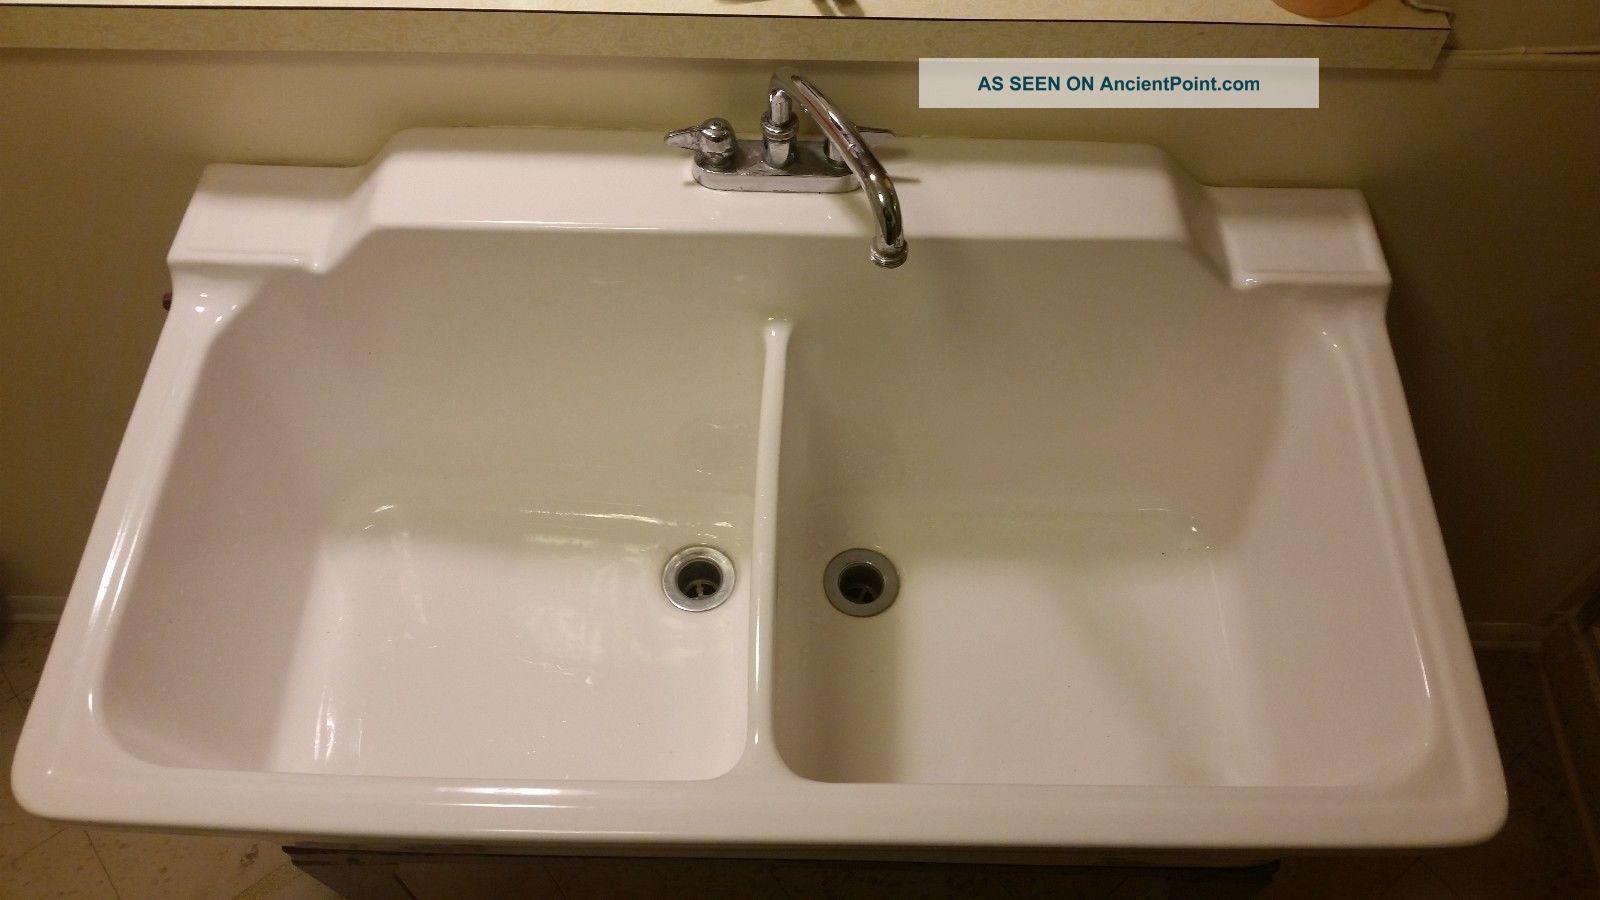 Double Basin Laundry Sink : Vintage Laundry Porcelain Double Basin Sink Sinks photo 1